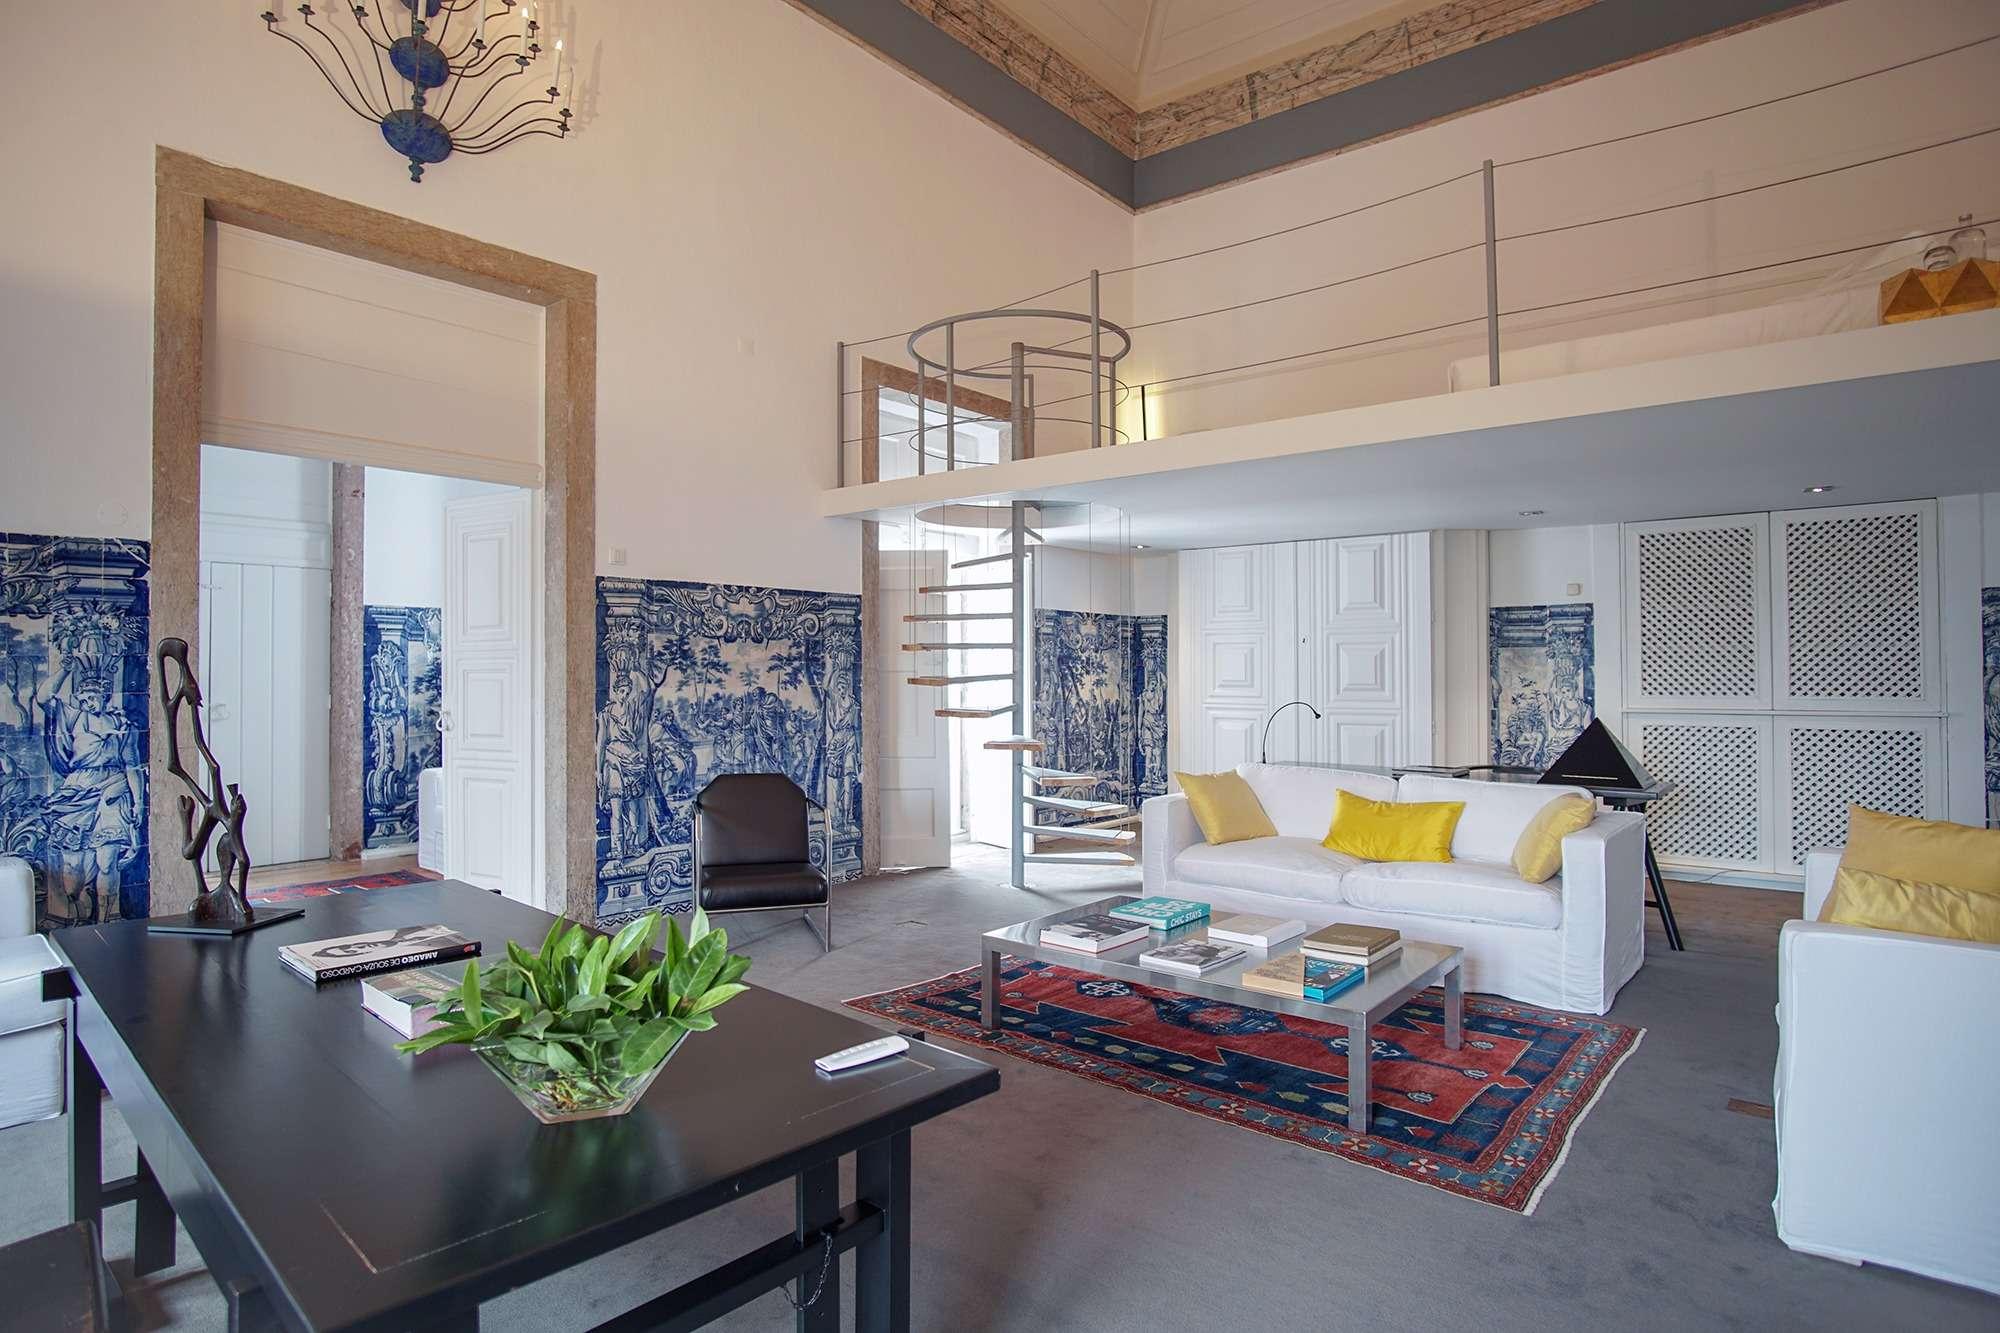 Palacio Belmonte Lisbon amadeo de souza cardoso suite